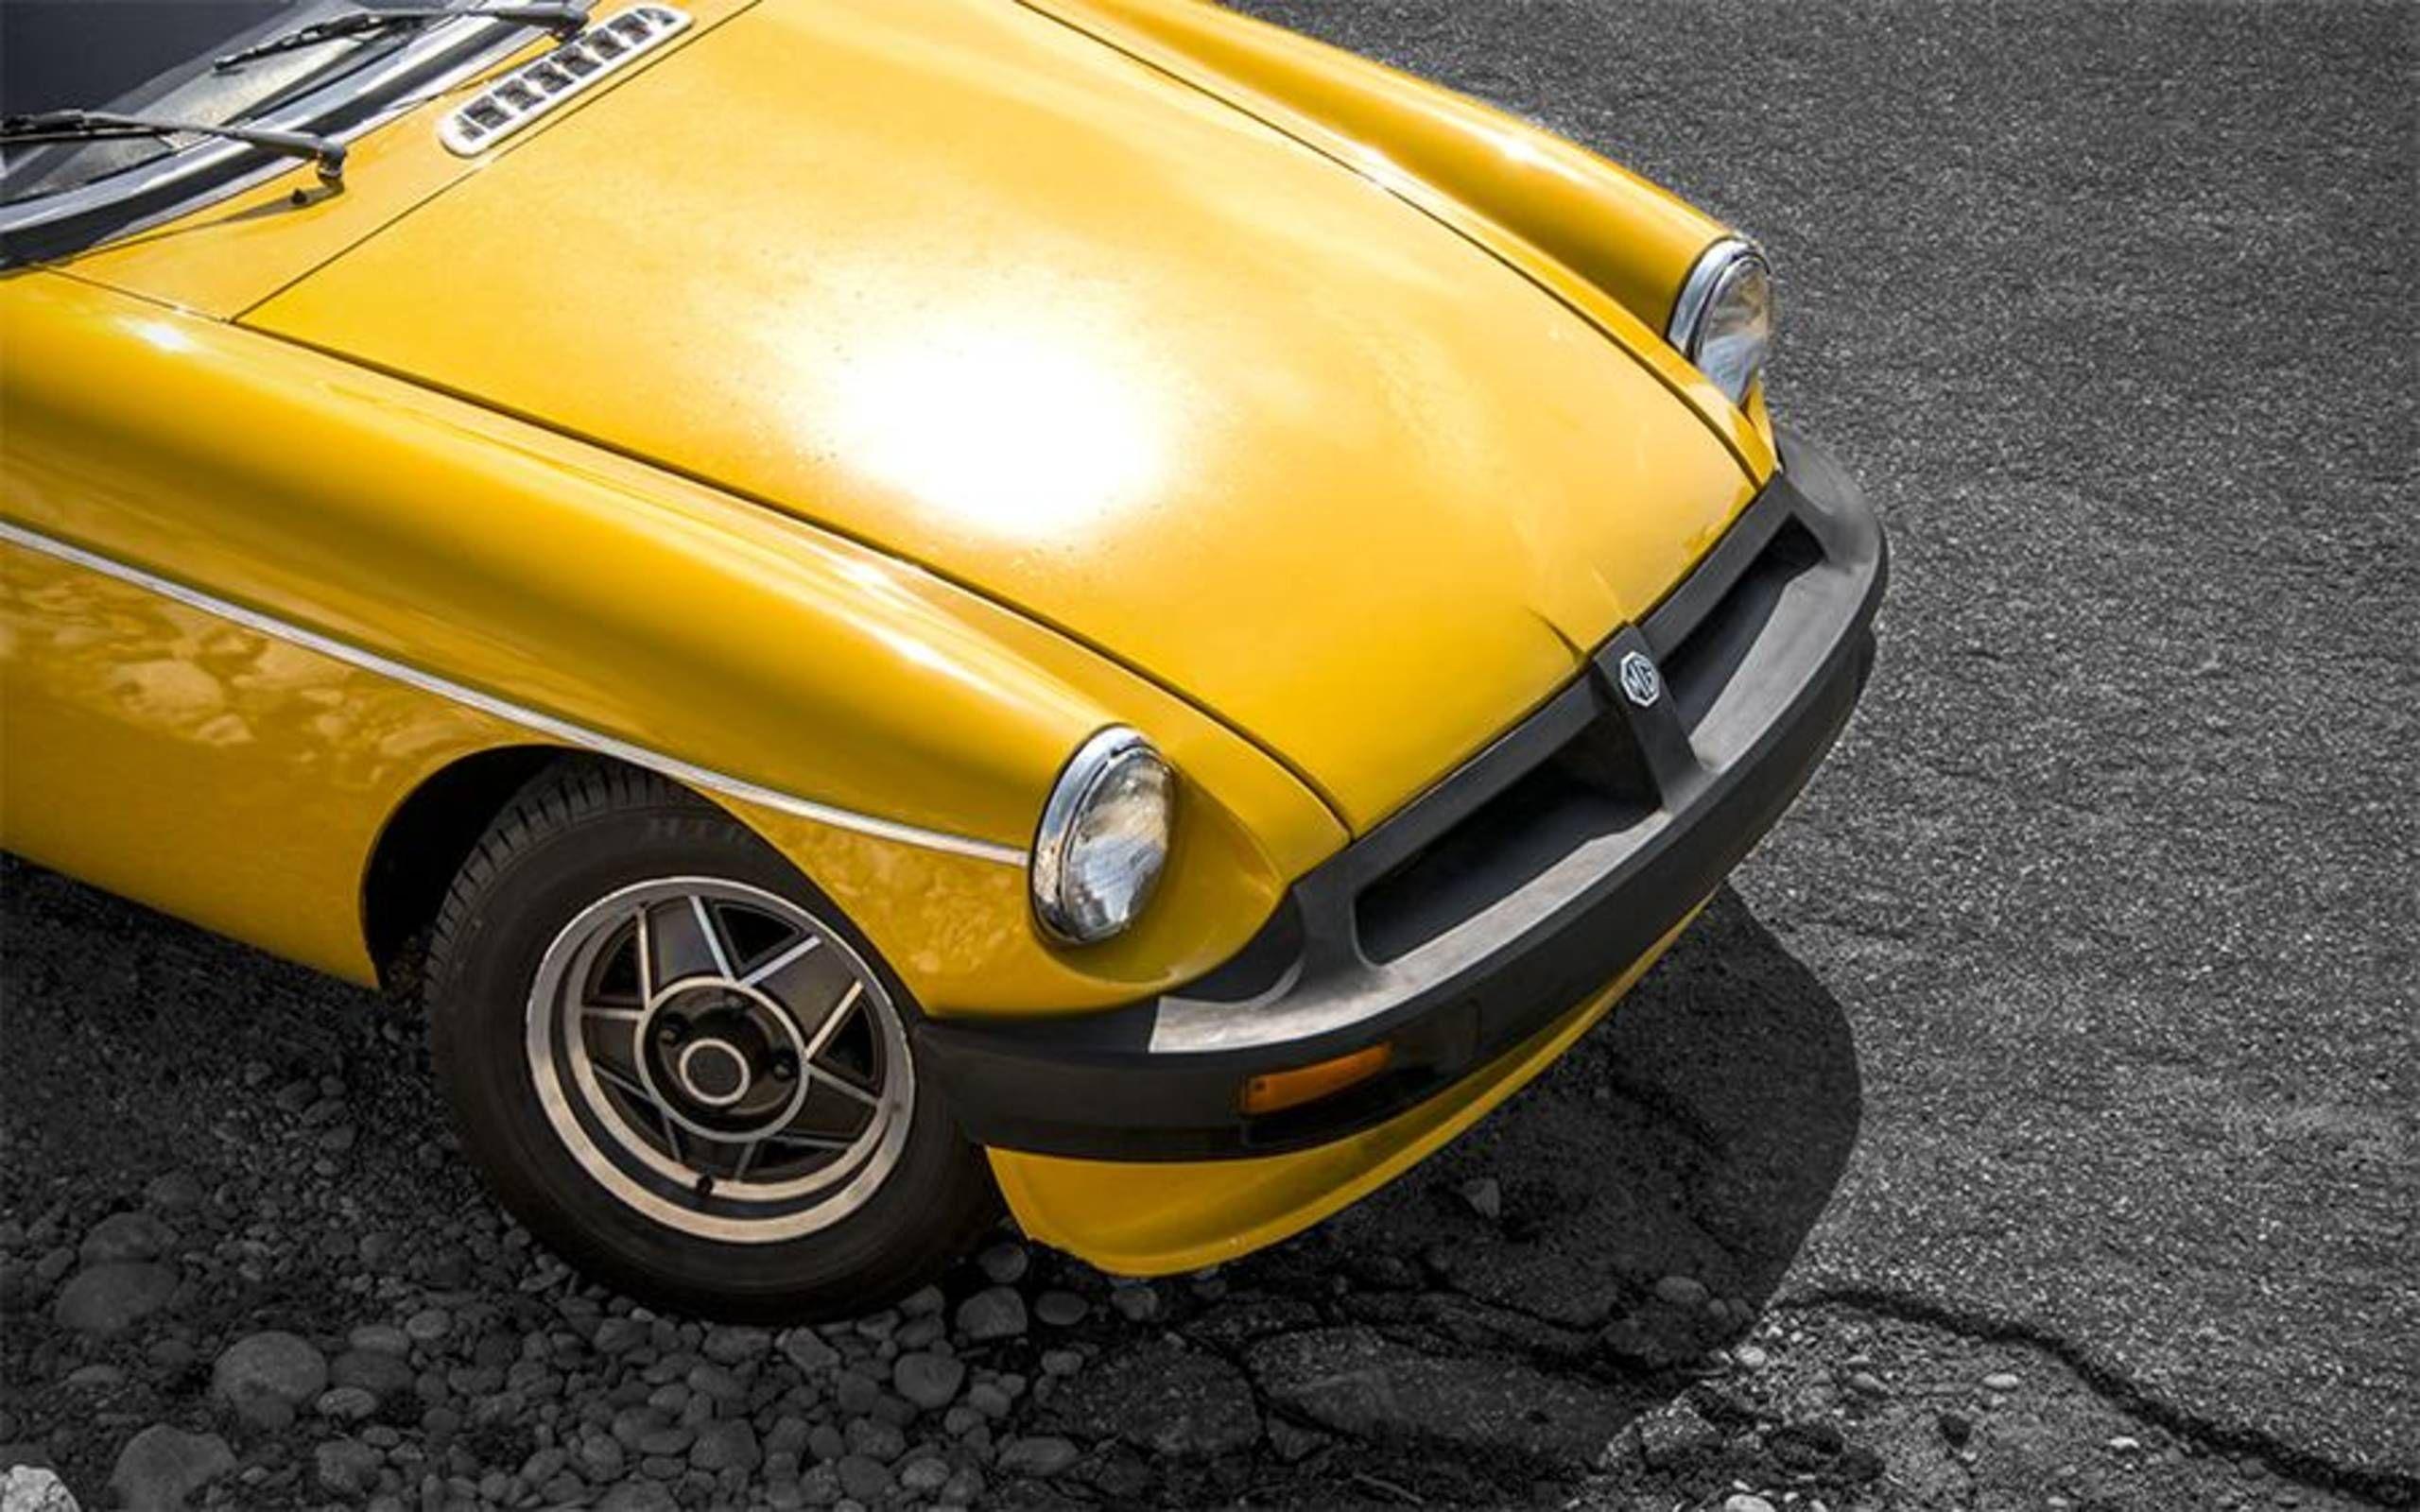 MGB ROADSTER /'62-/'80 MGB-GT /'65-/'67 REAR BRAKES REBUILD KIT